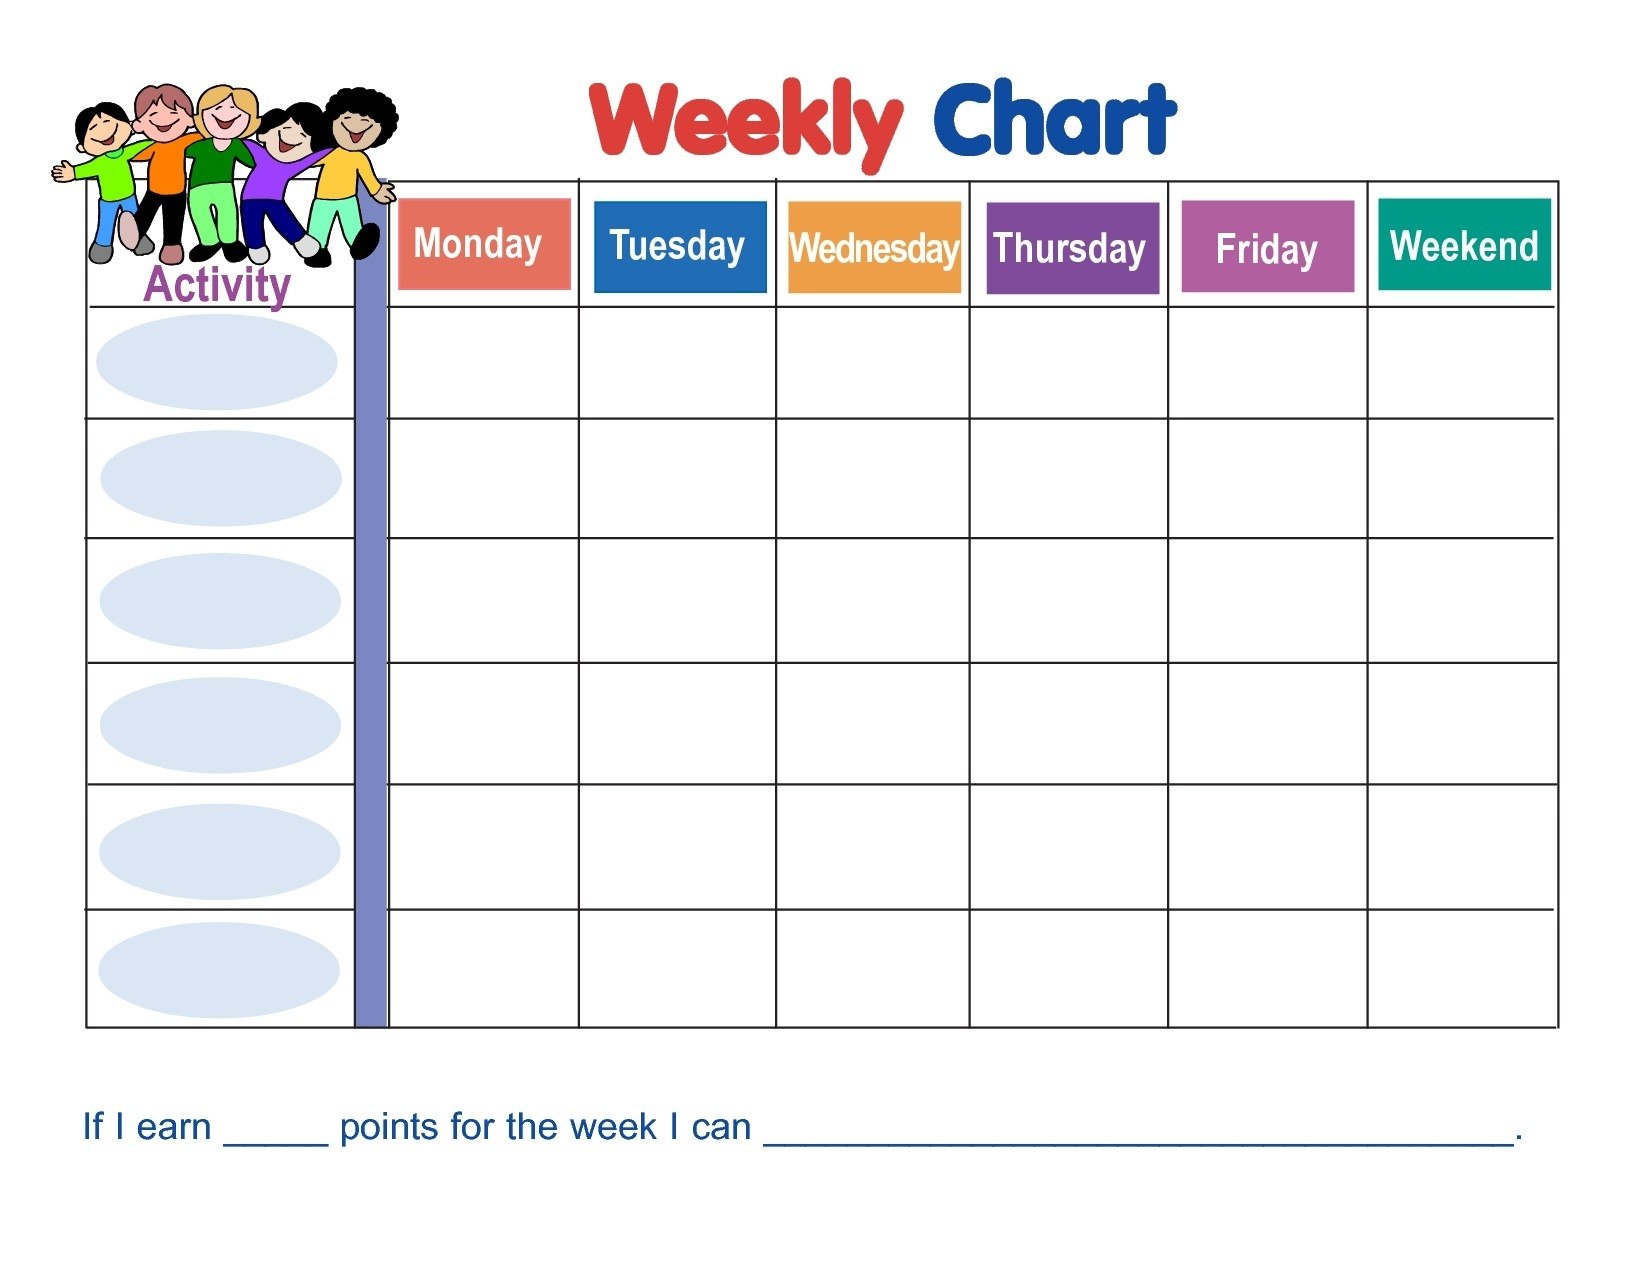 Blank Behavior Calendar 2017 Calendar In Monthly Behavior Calendar pertaining to Free Behavior Calendars For Kindergarten